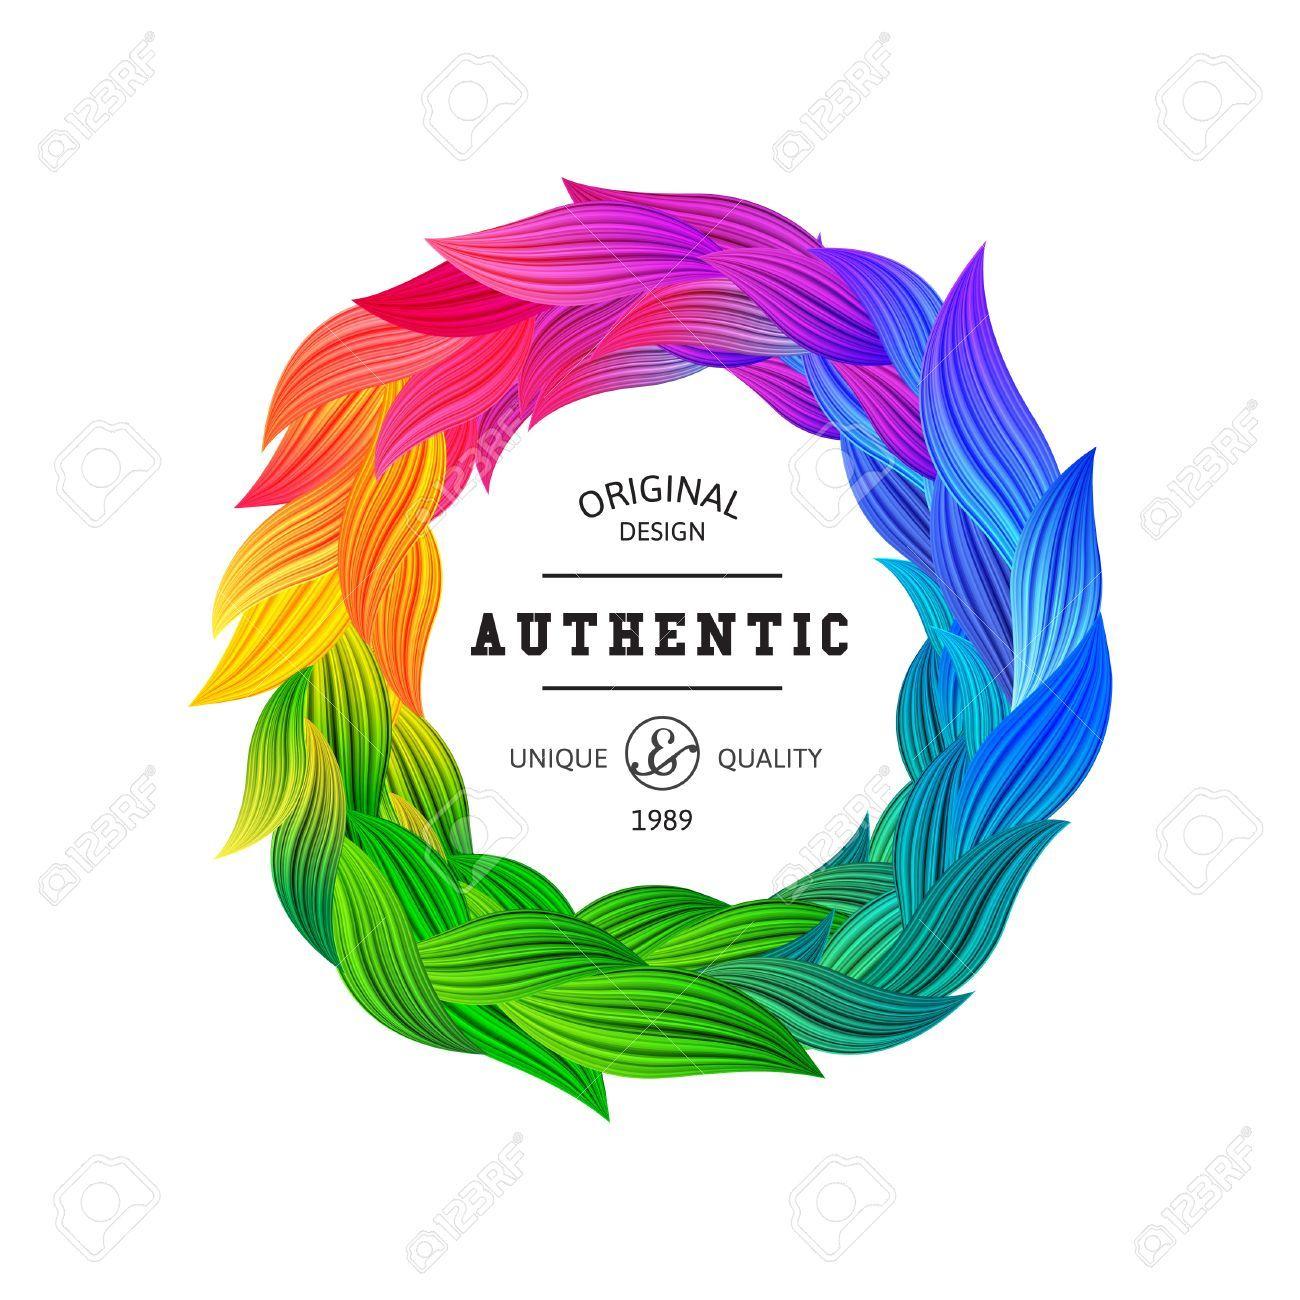 Colorful Circle Logo Design Elements & Ideas